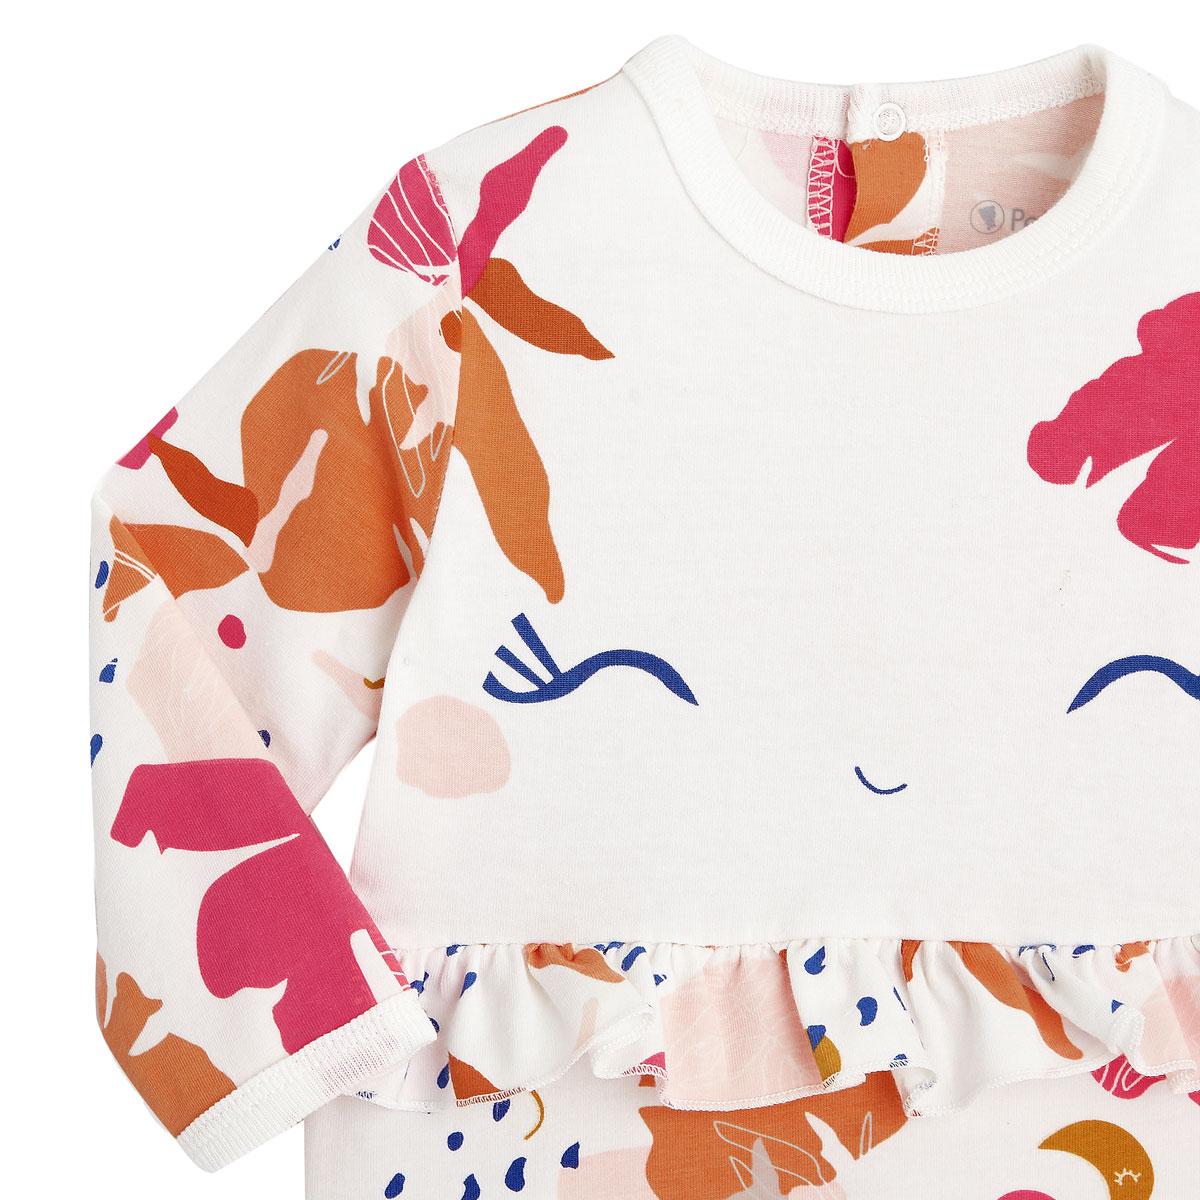 Pyjama bébé contenant du coton bio Perle de Lune zoom